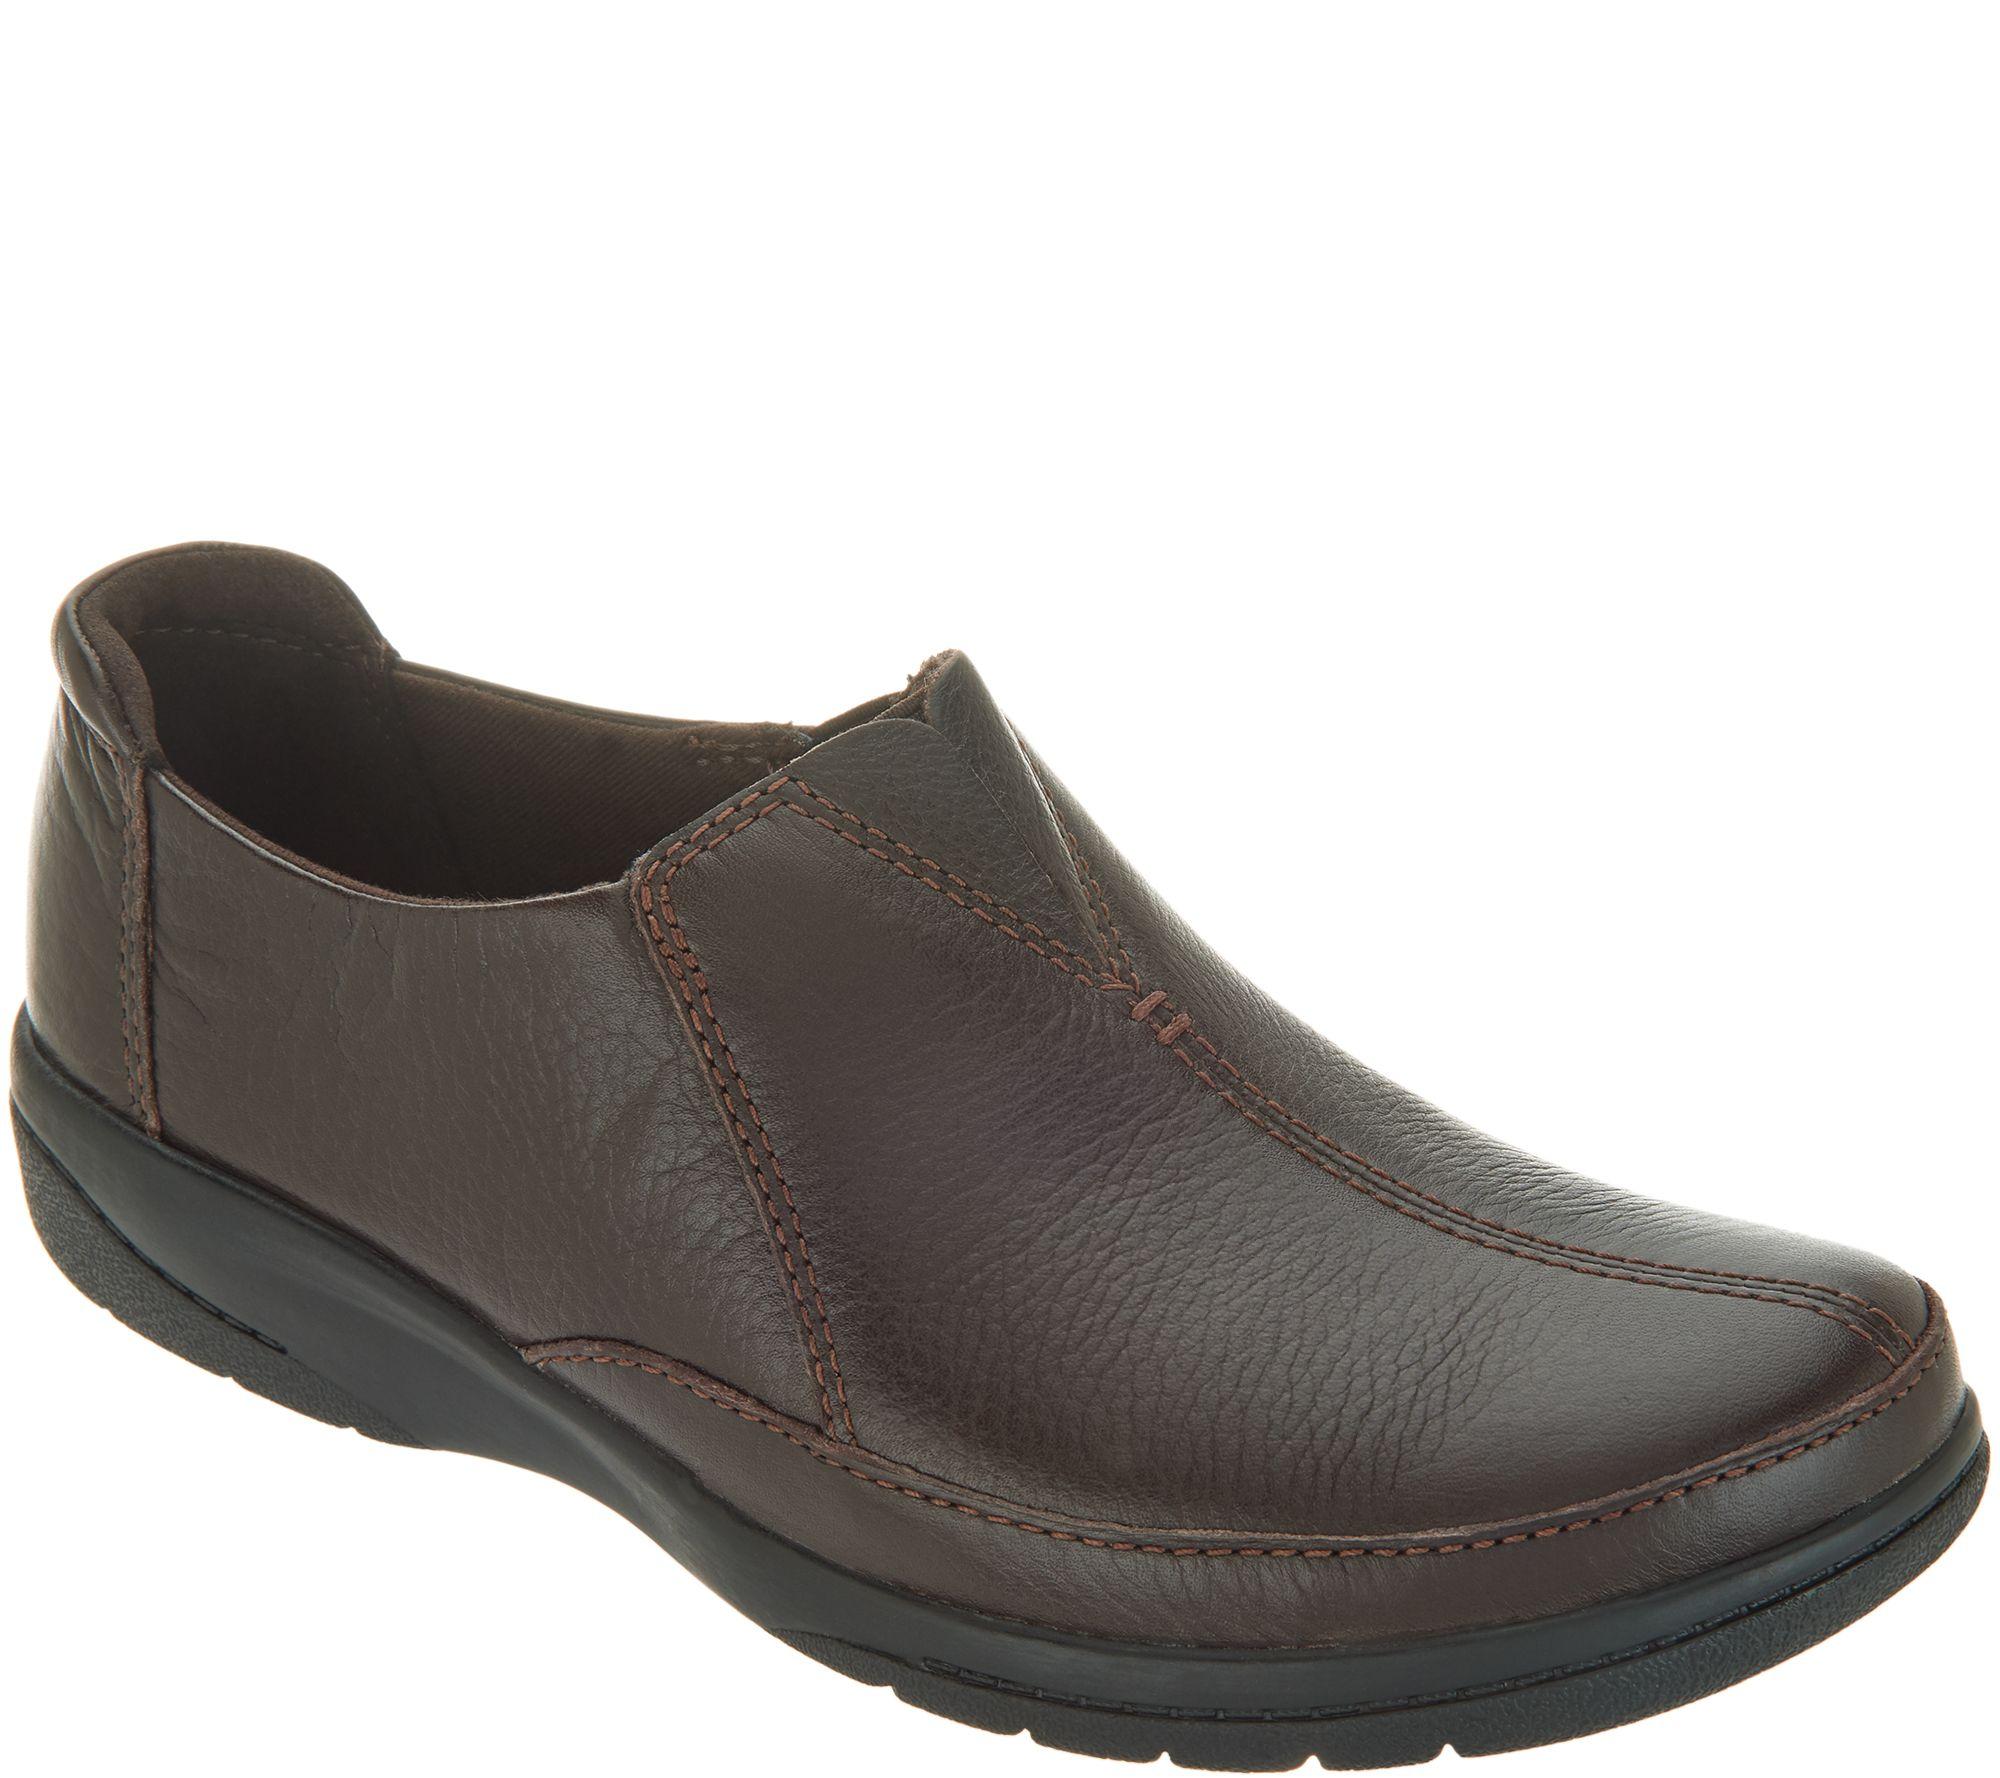 ae663b01bc70 Clarks Leather Slip-On Shoes - Cheyn Bow - Page 1 — QVC.com